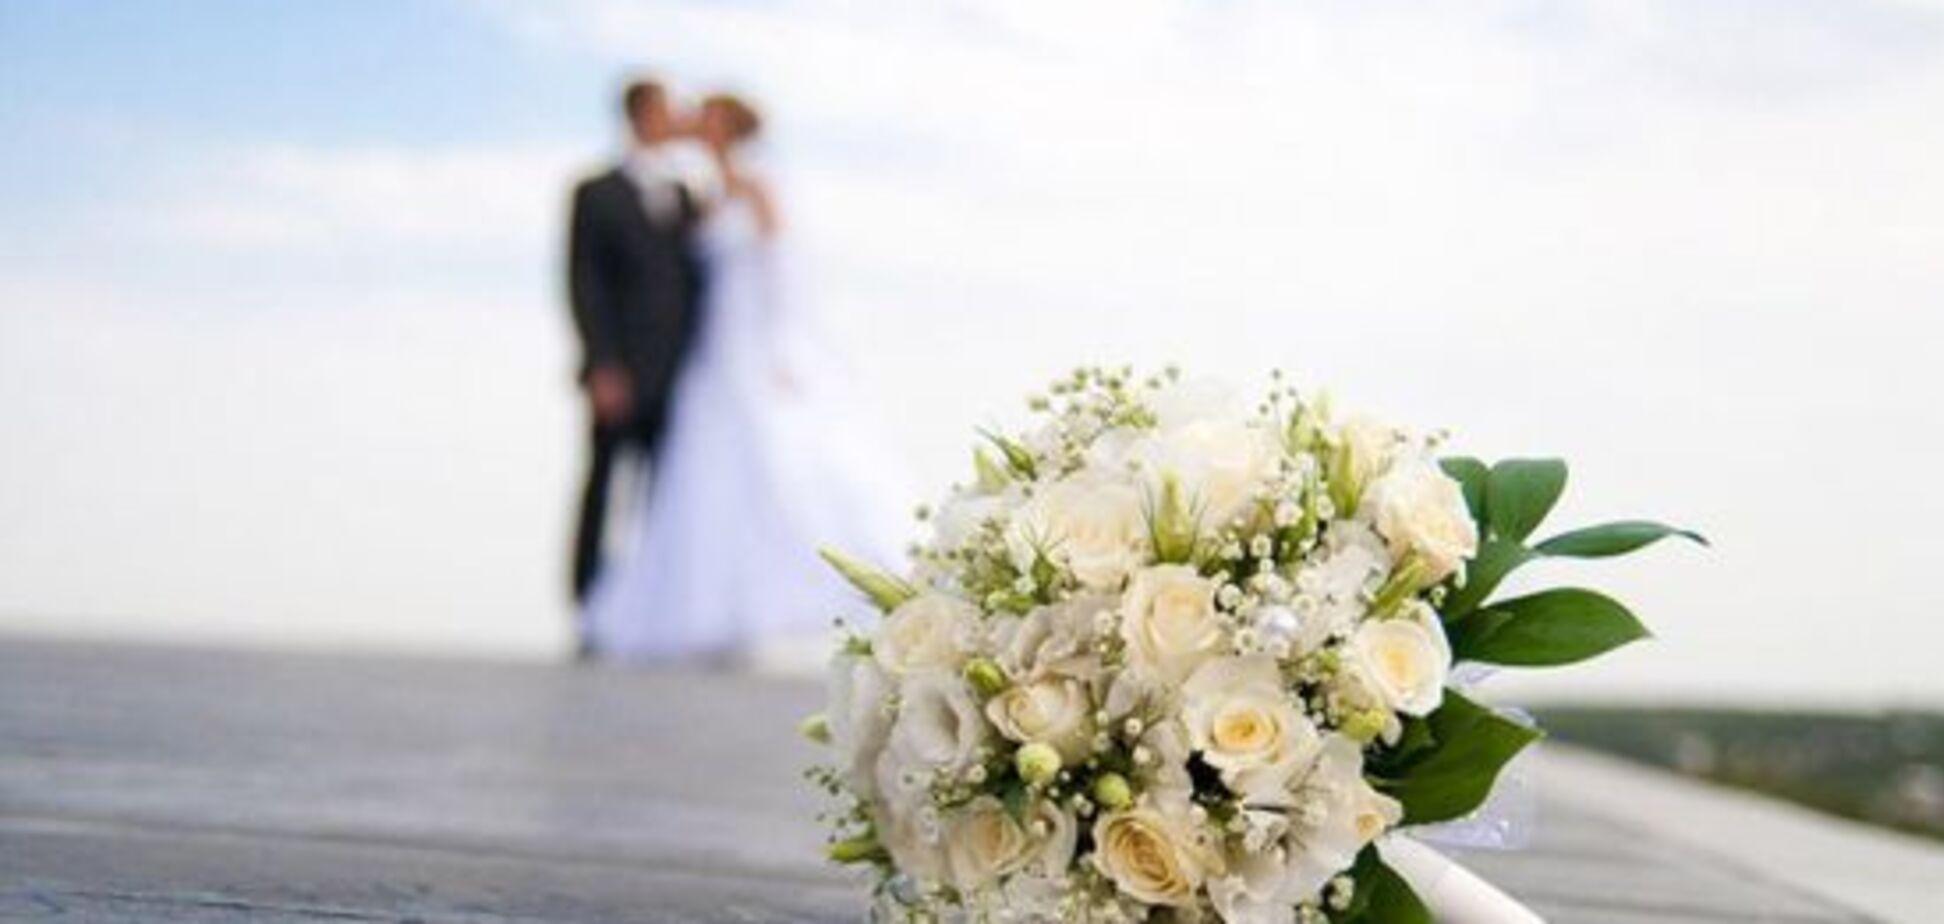 'Ах, эта свадьба, свадьба, свадьба пела и плясала…'